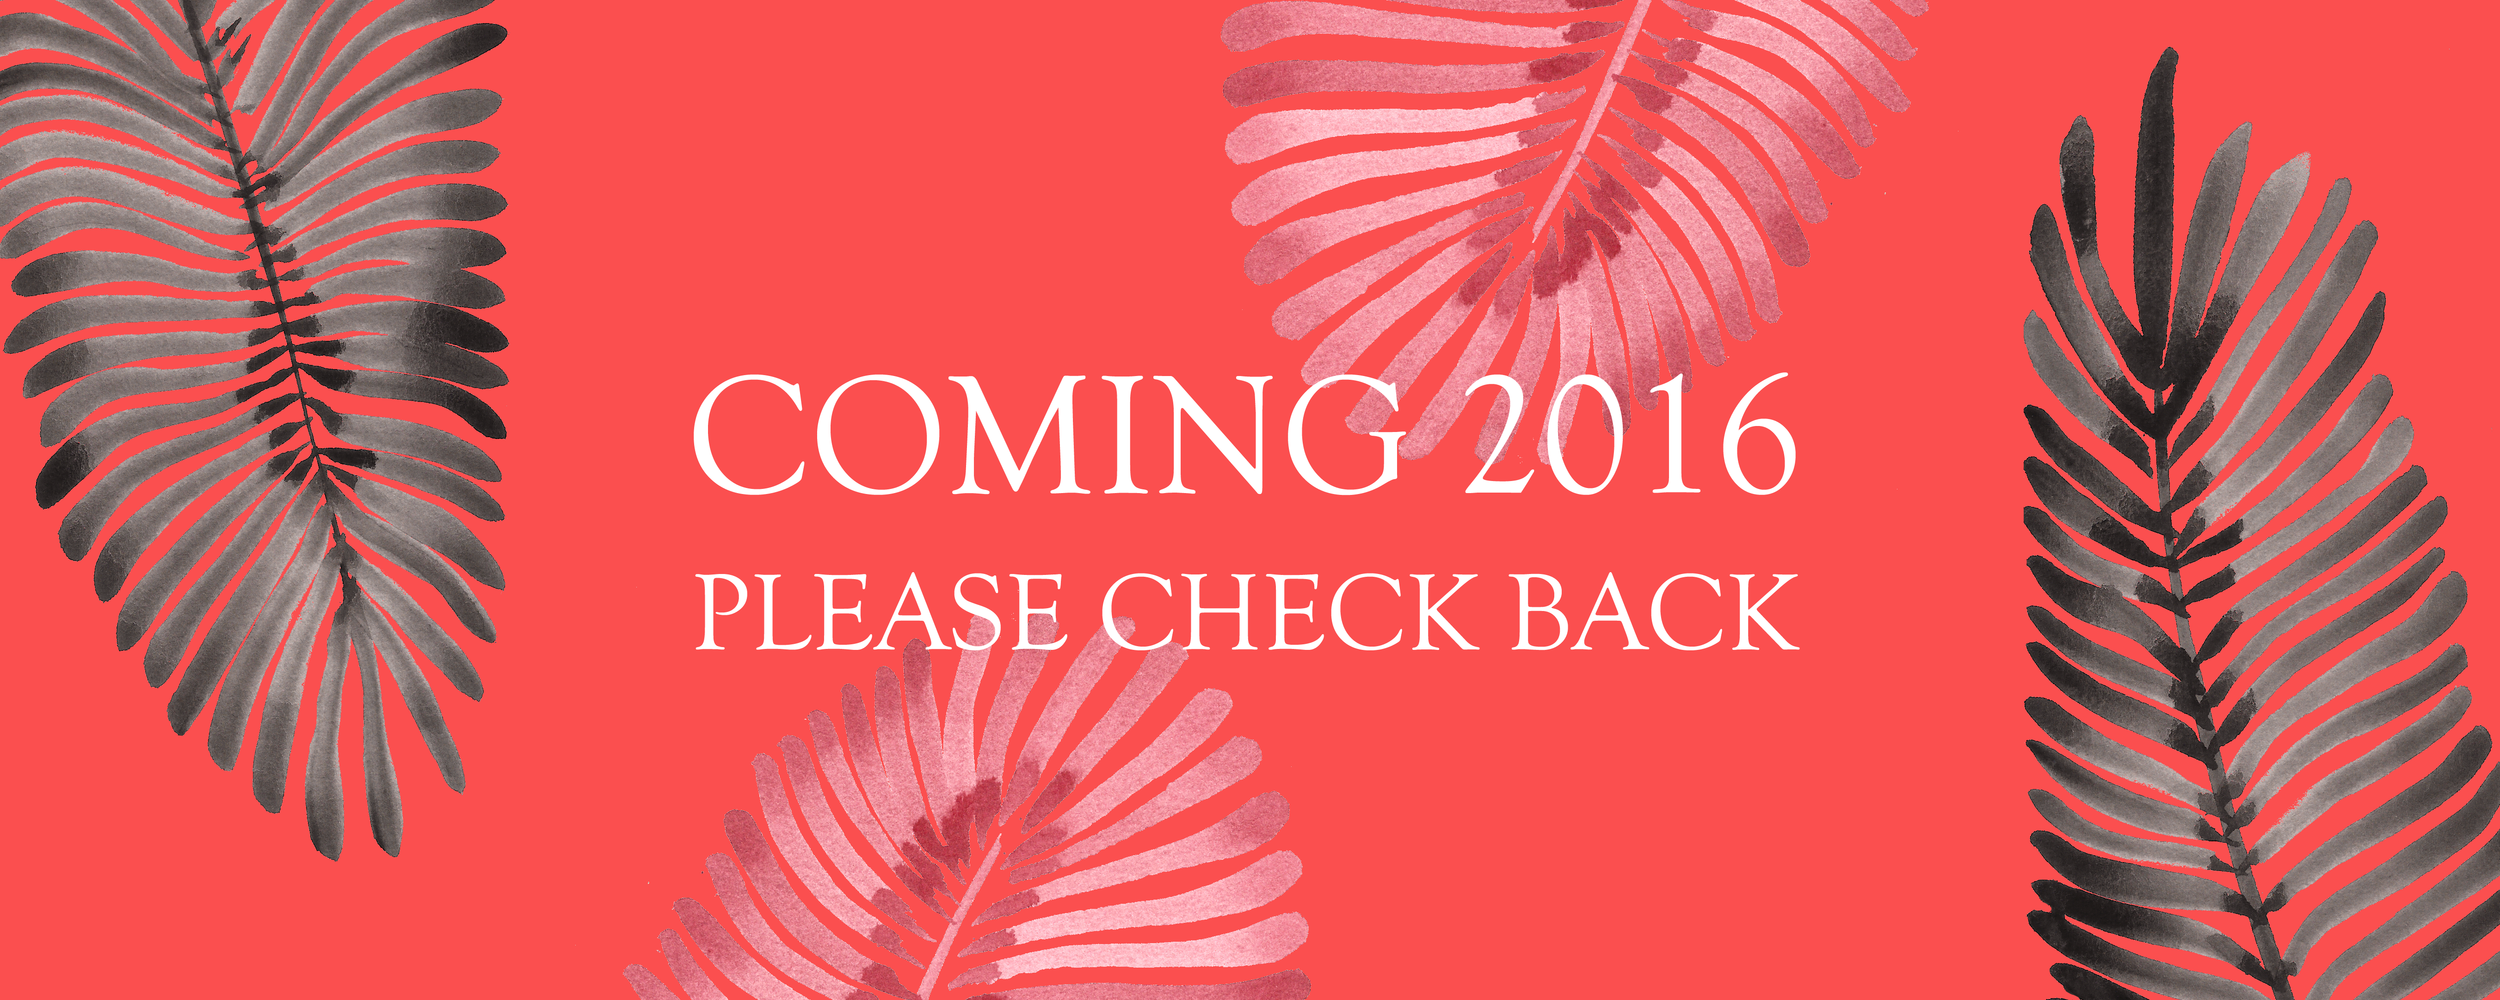 marianneangelirodriguez.com Shop Coming 2016.png